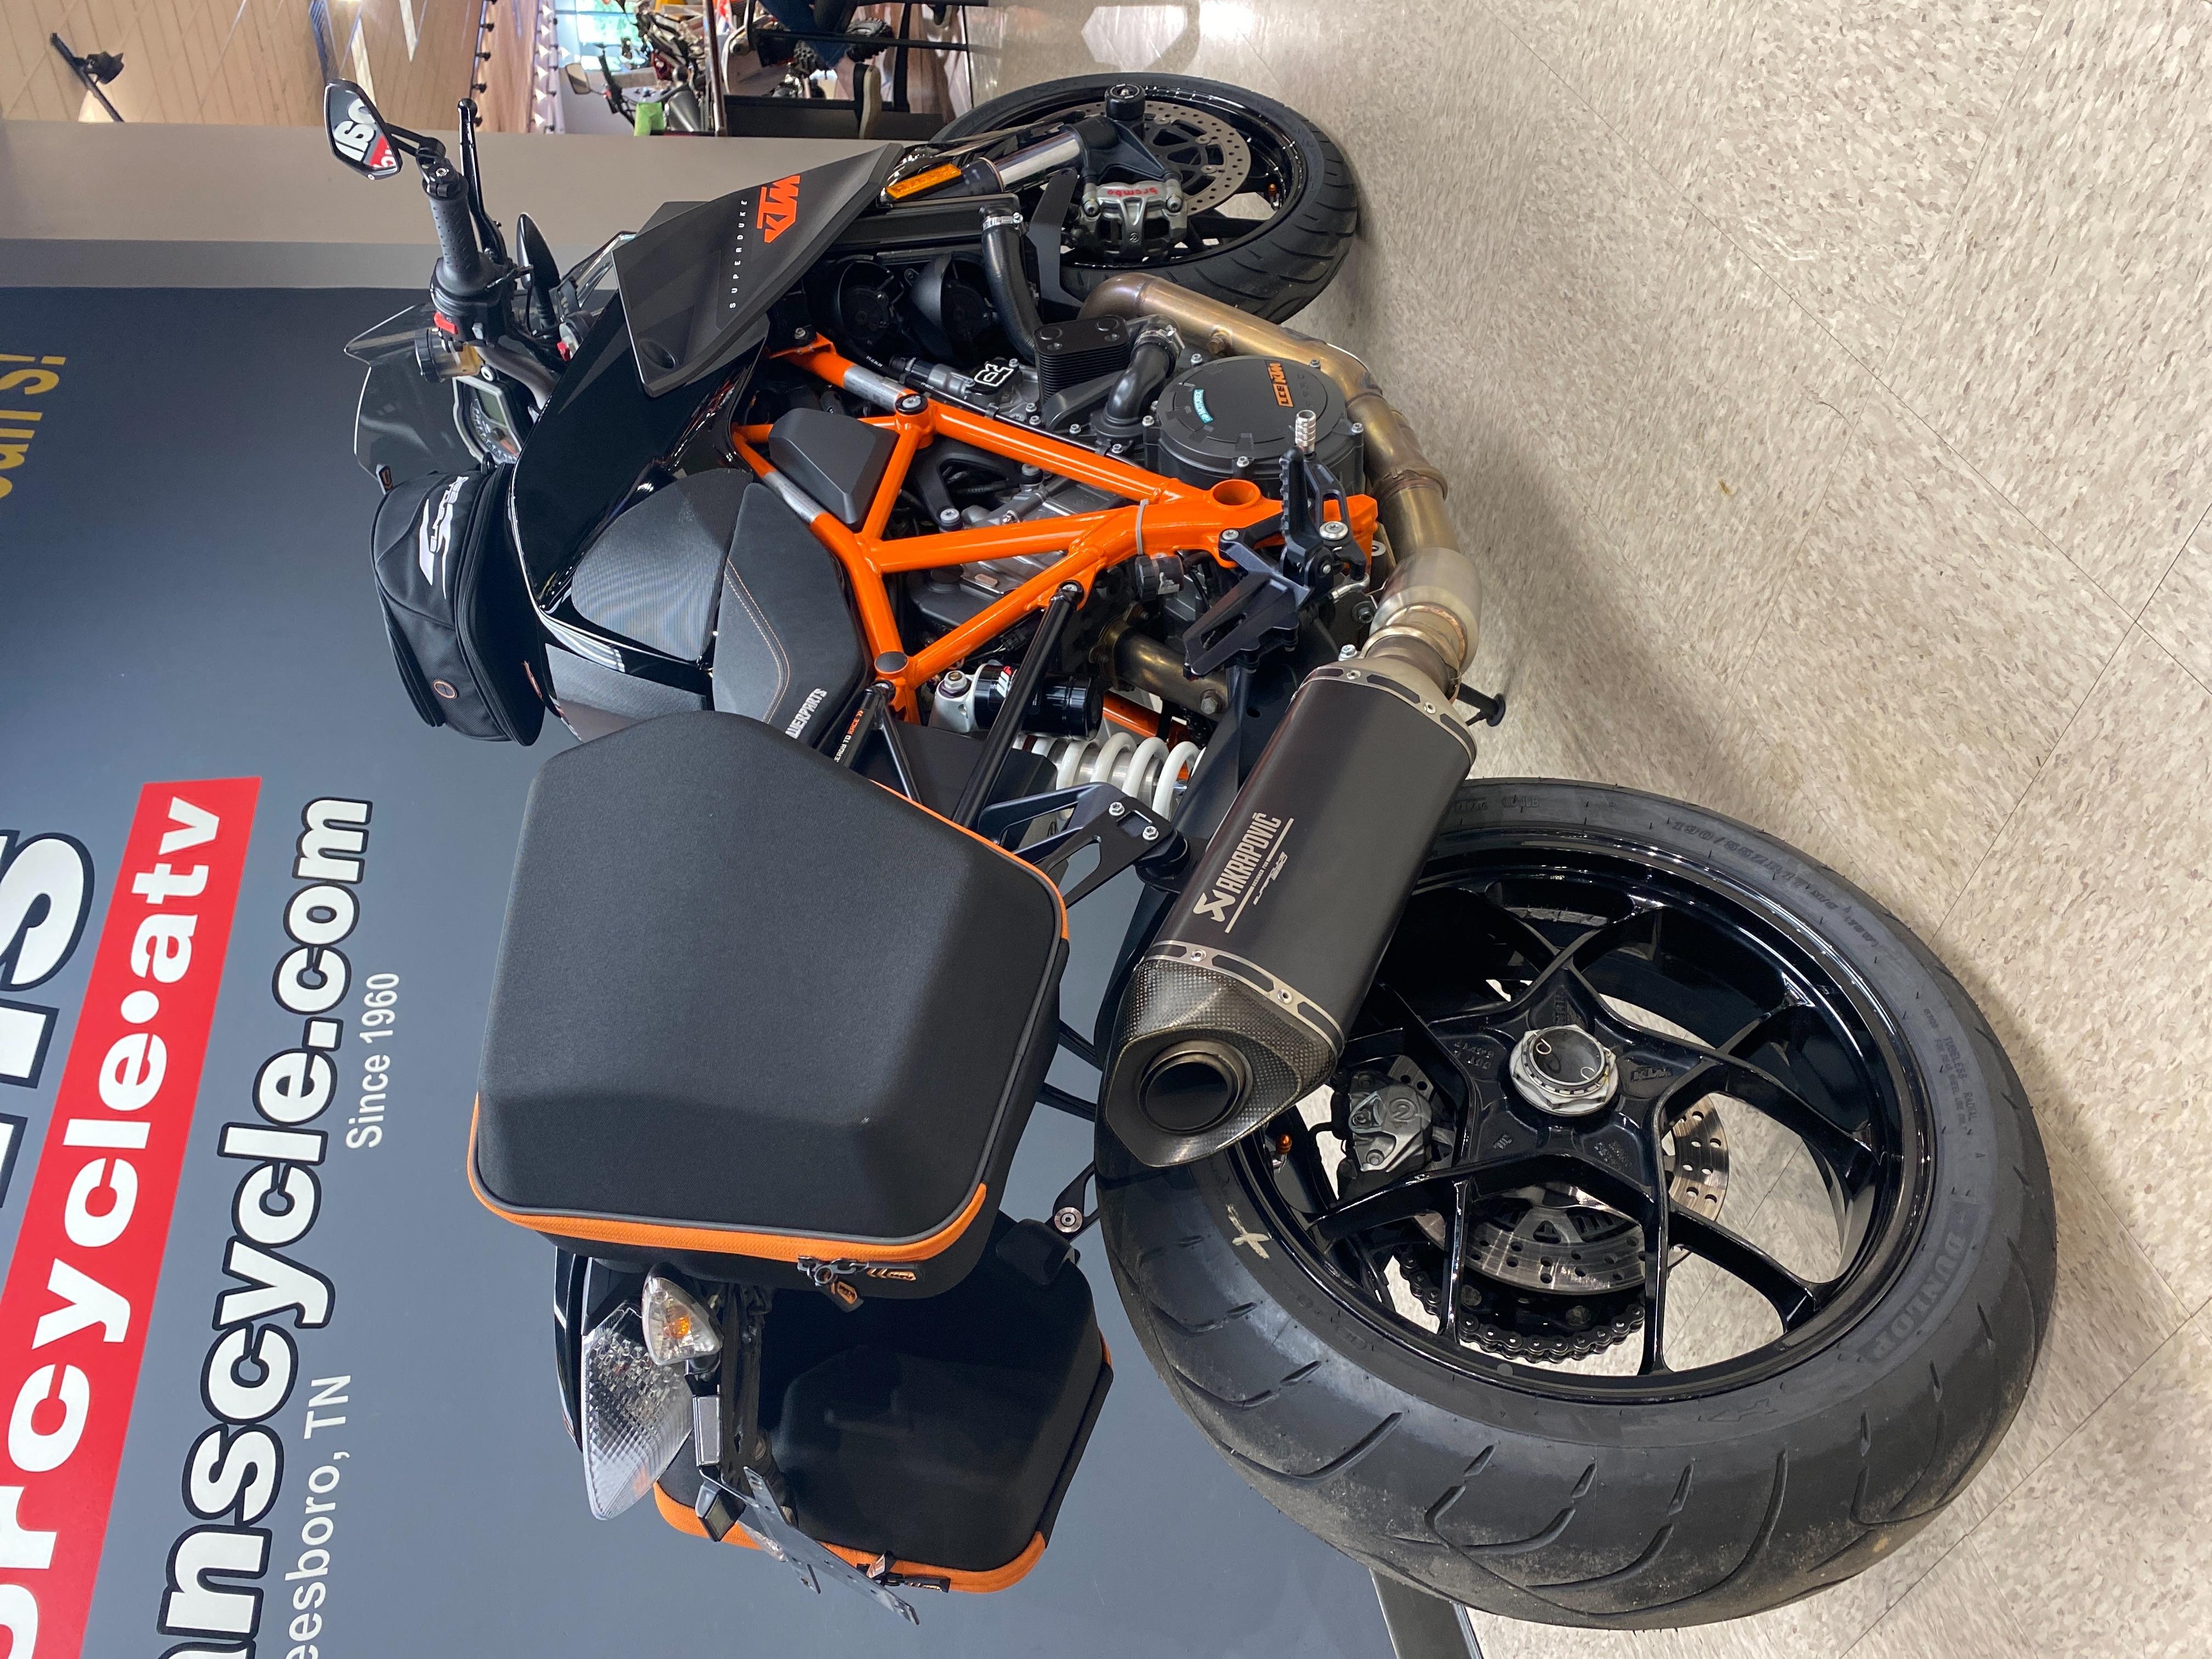 2016 KTM Super Duke 1290 R at Sloans Motorcycle ATV, Murfreesboro, TN, 37129